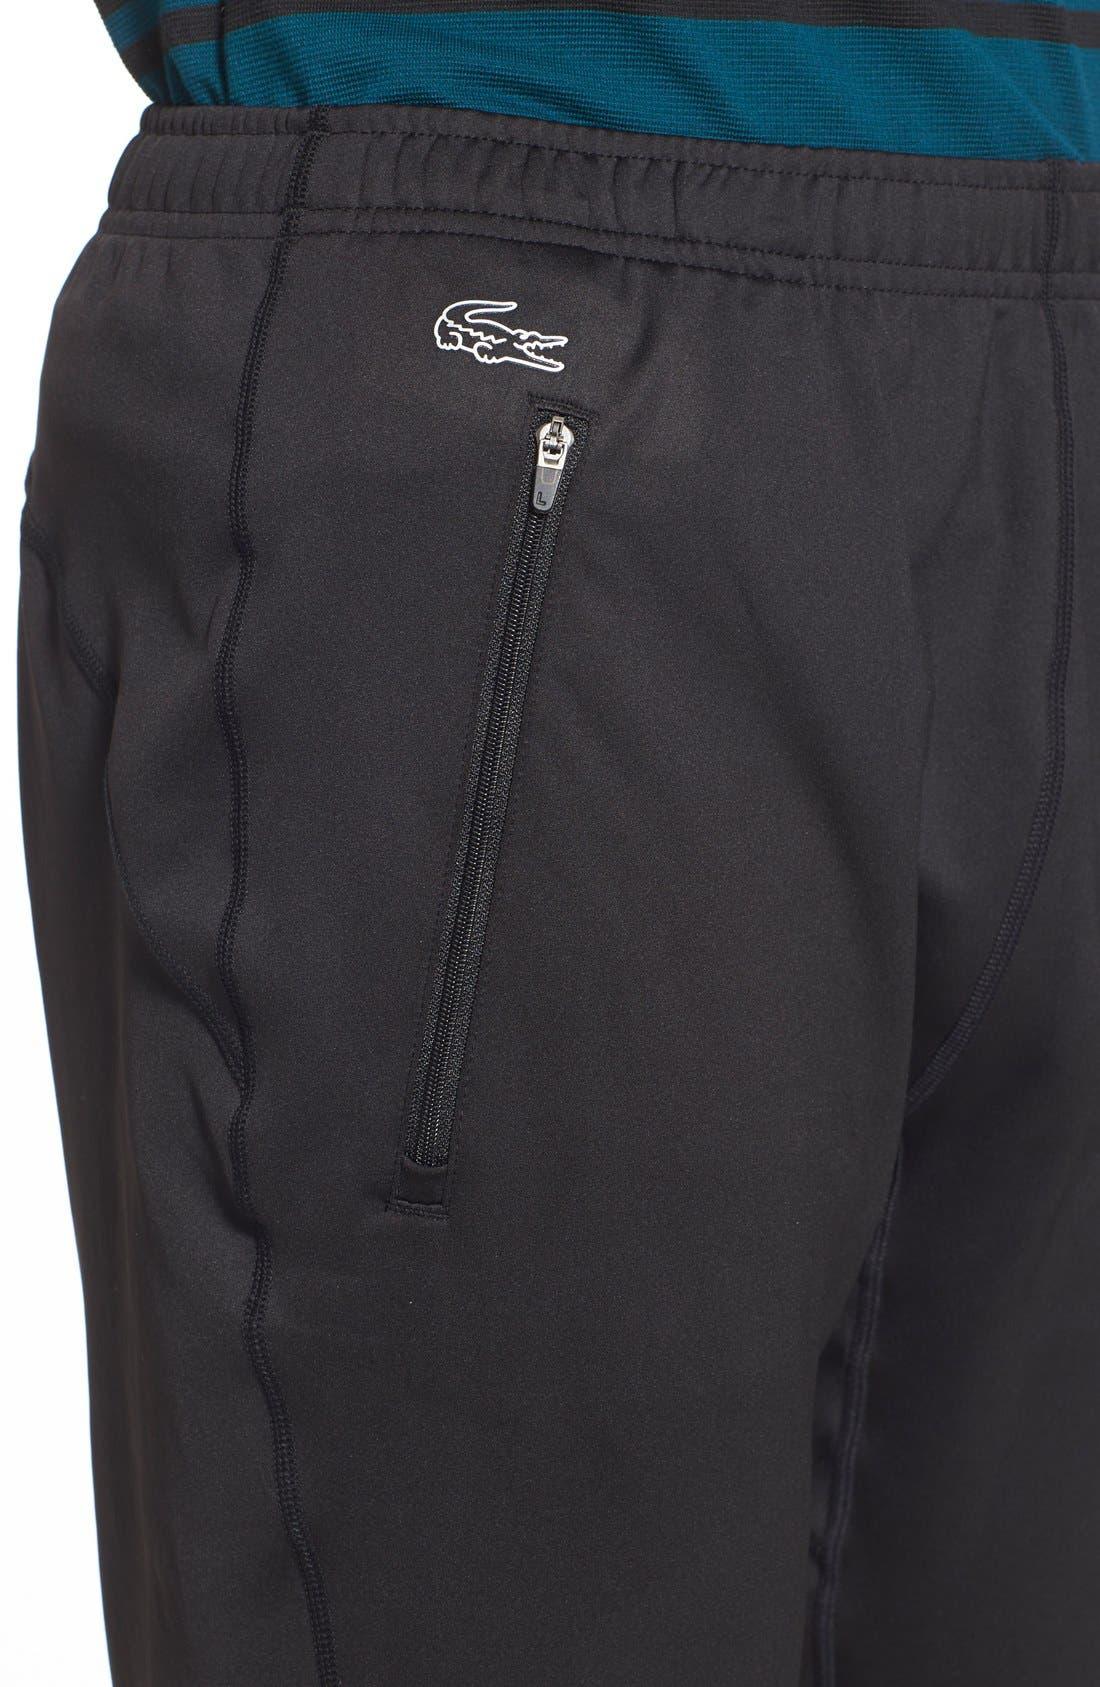 Alternate Image 4  - Lacoste'Sport' Ultra Dry Stretch Performance Track Pants